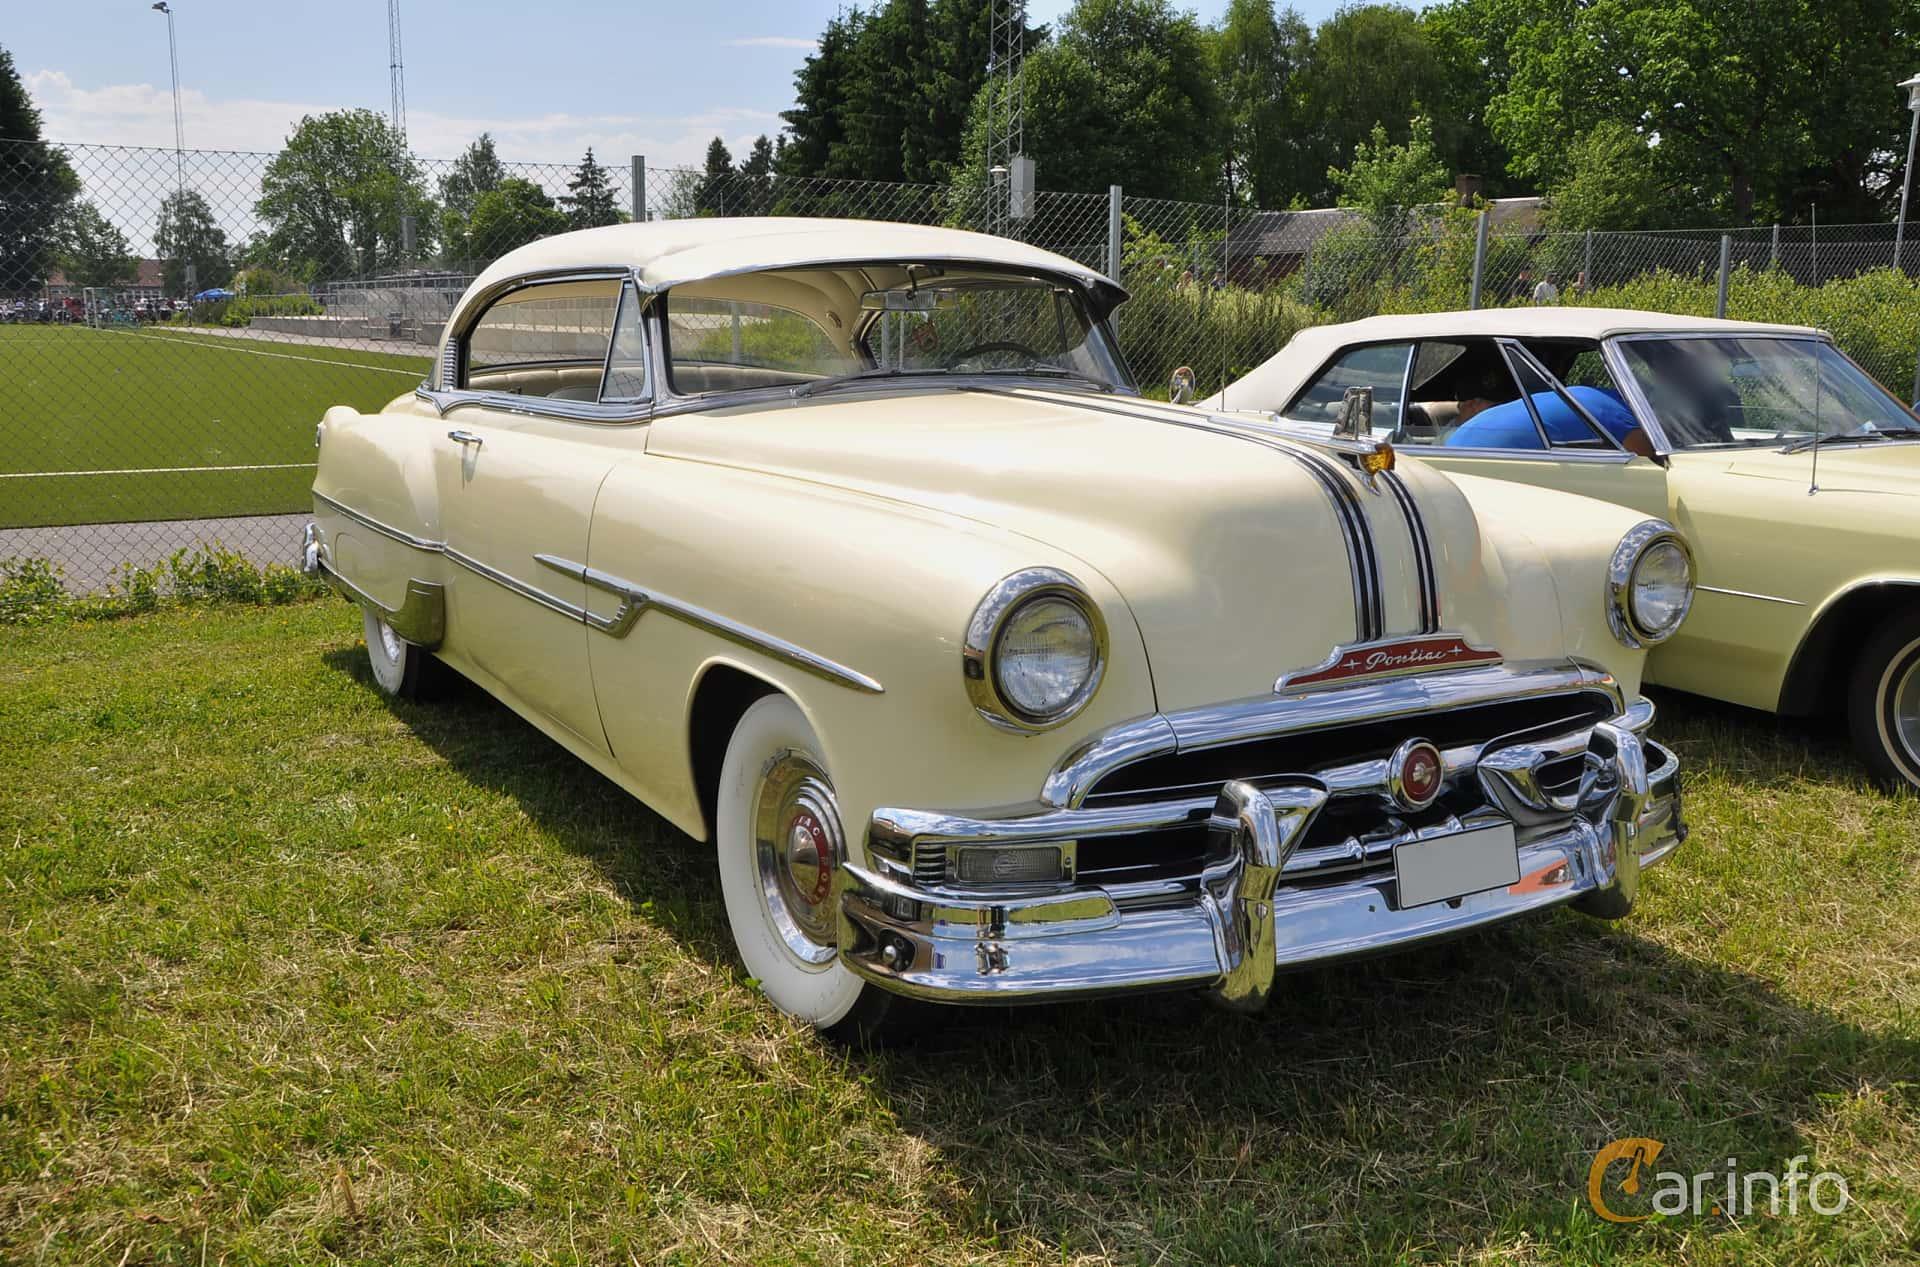 Tagen P Power America Fest 2016 1953 Pontiac Chieftain Sedan 4 Door 44 Hydra Matic 120hp At